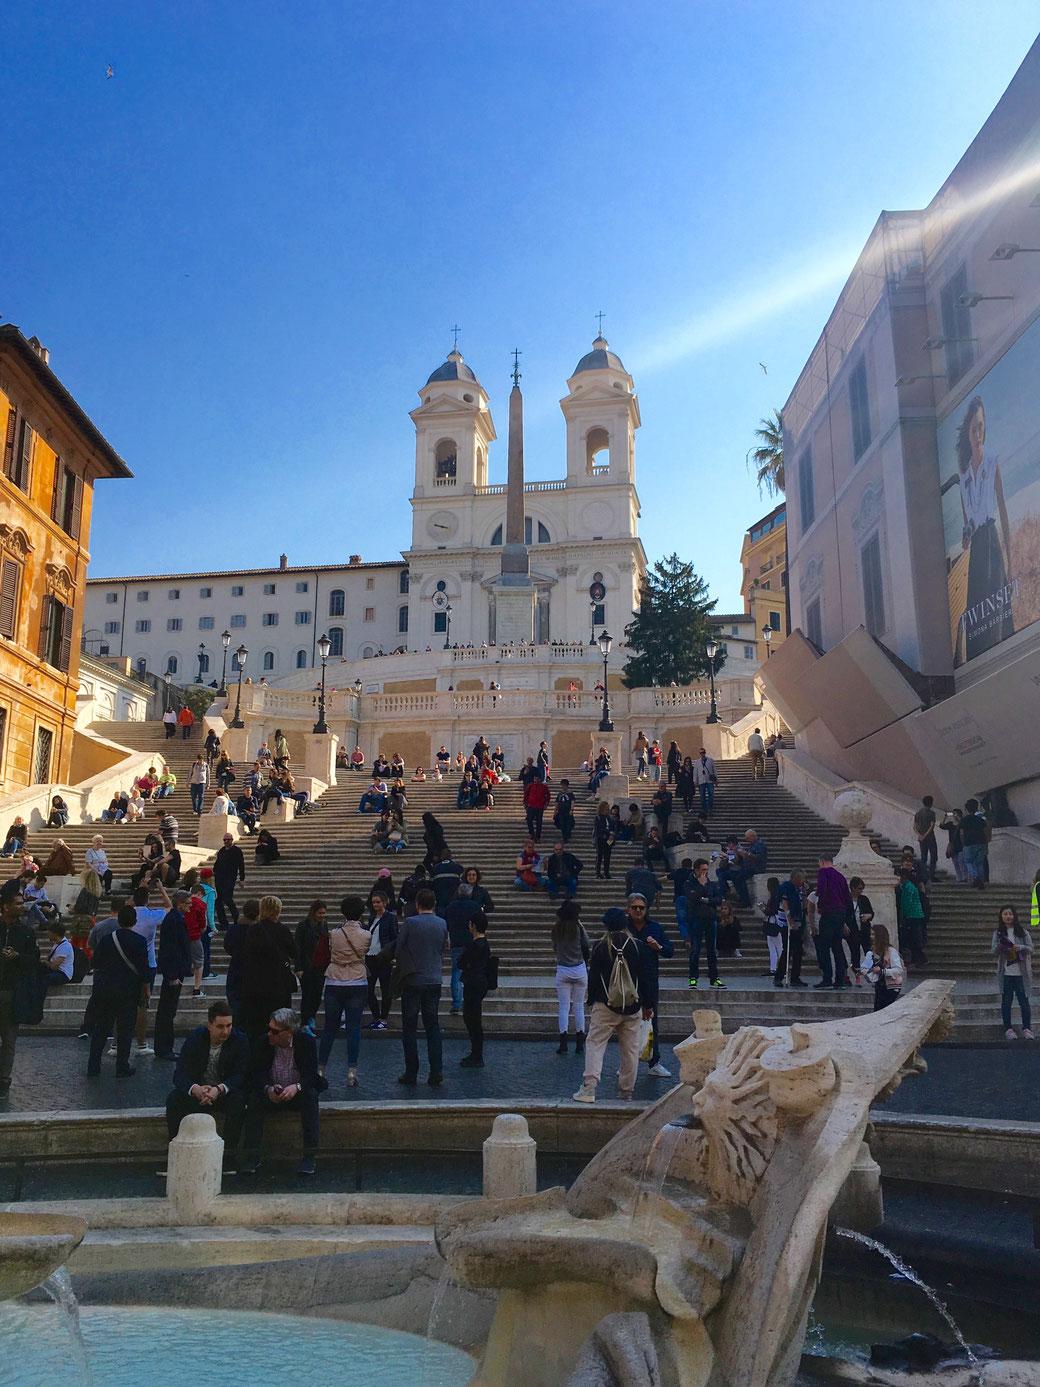 Spanische Treppe mit der Kirche Santa Trinità dei Monti.